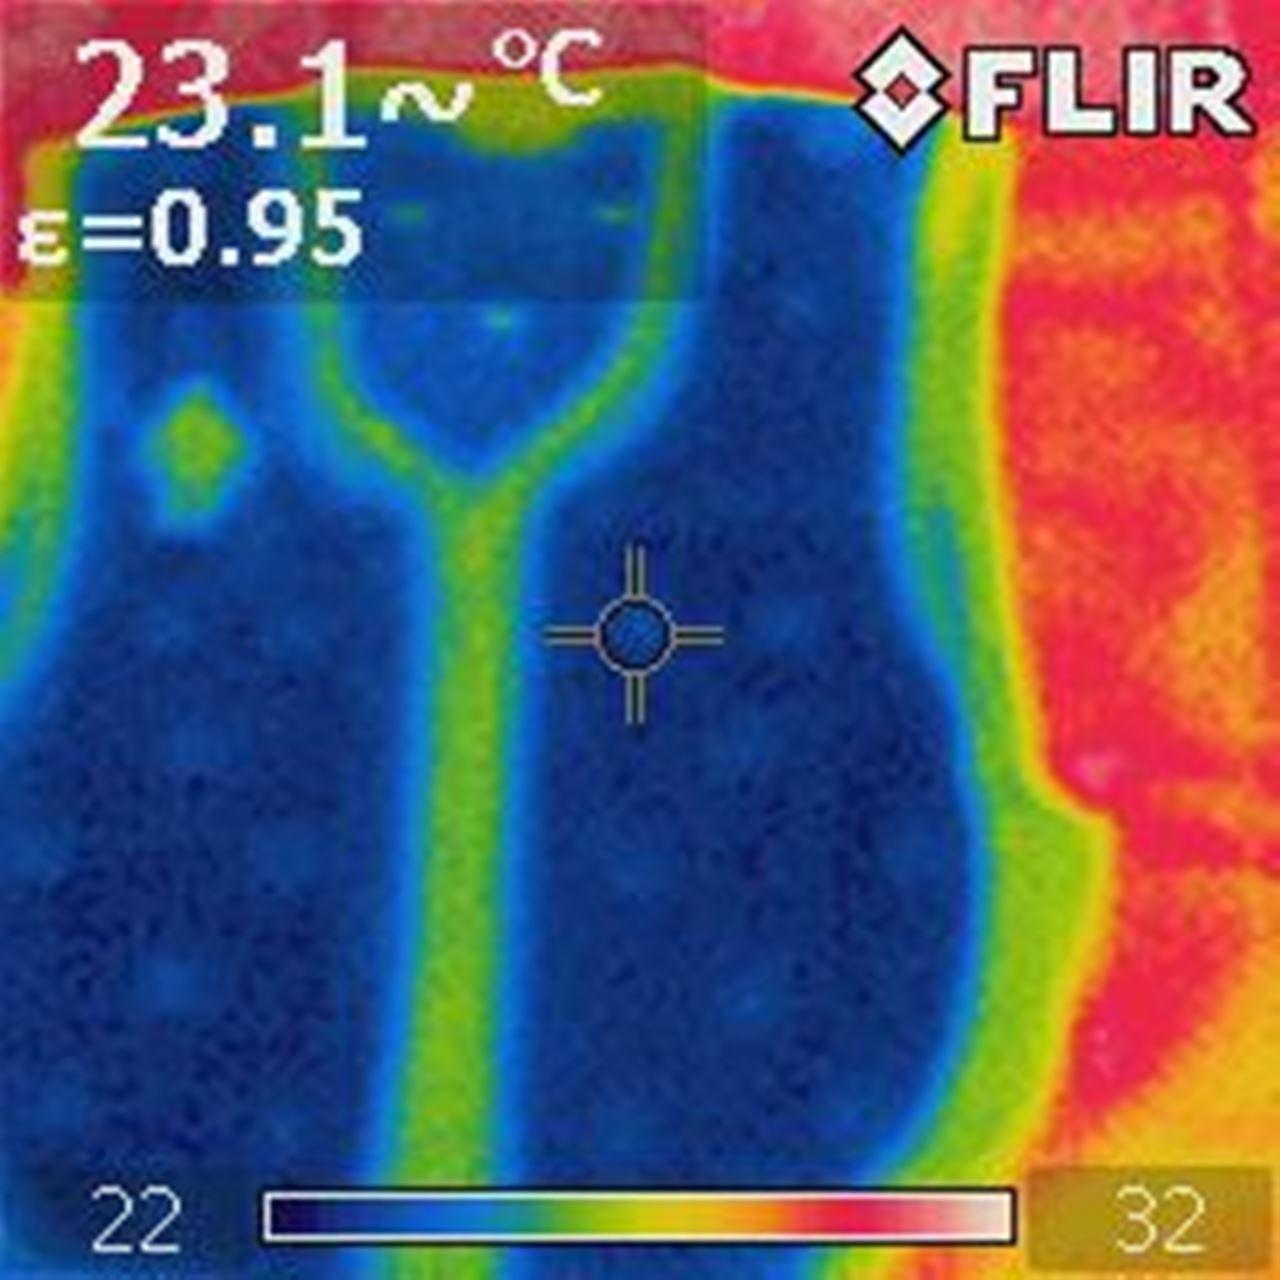 Foto de MACNA Dry Cooling, otro chaleco para ir frescos en verano (7/10)